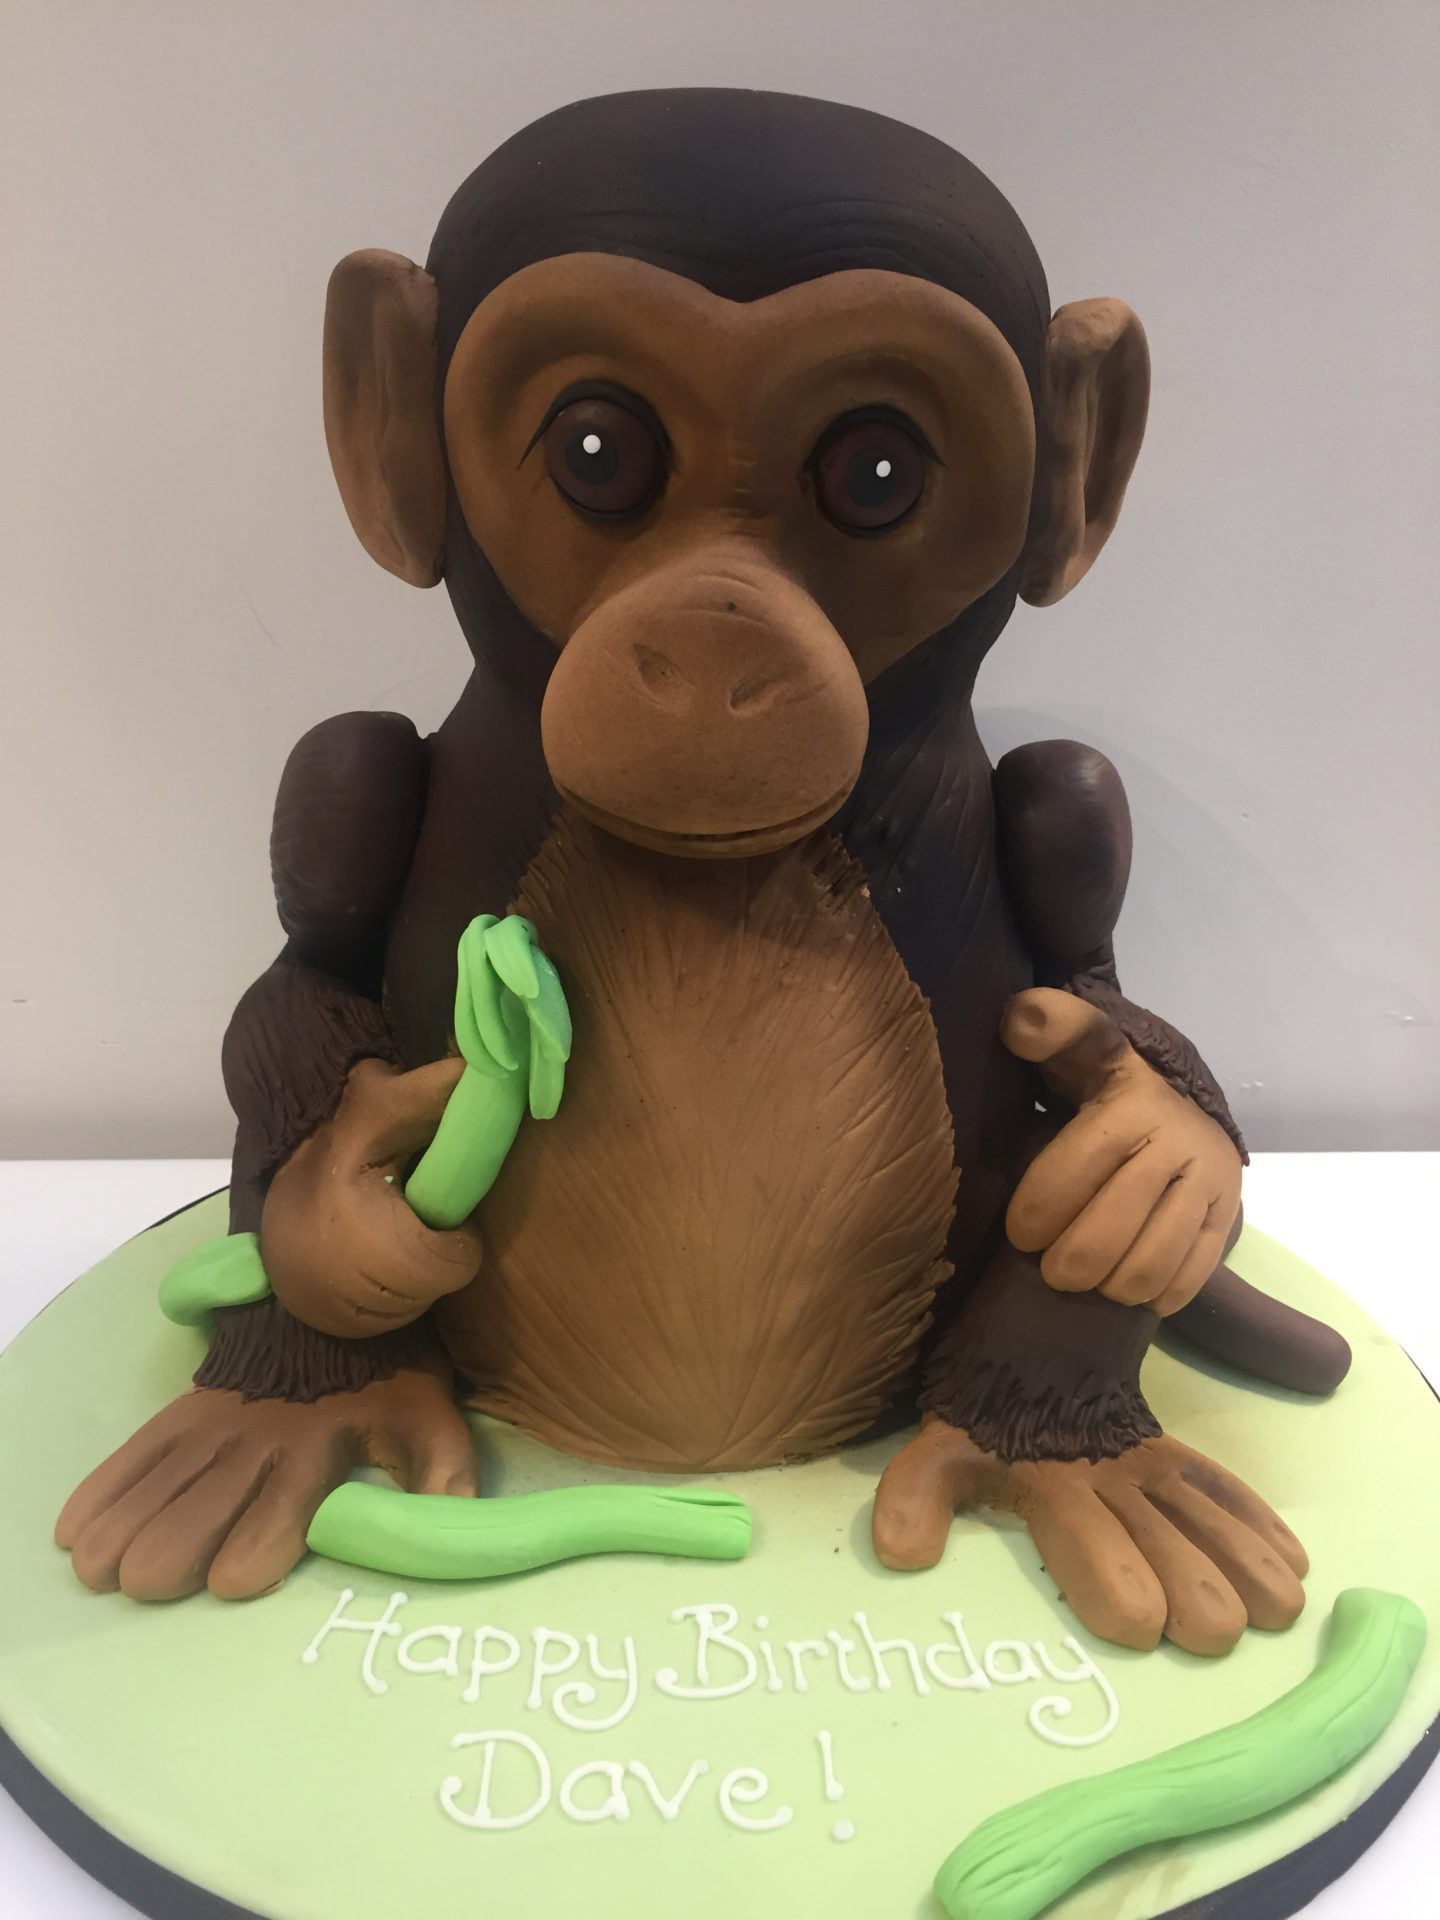 Magnificent Monkey Cake Etoile Bakery Personalised Birthday Cards Paralily Jamesorg